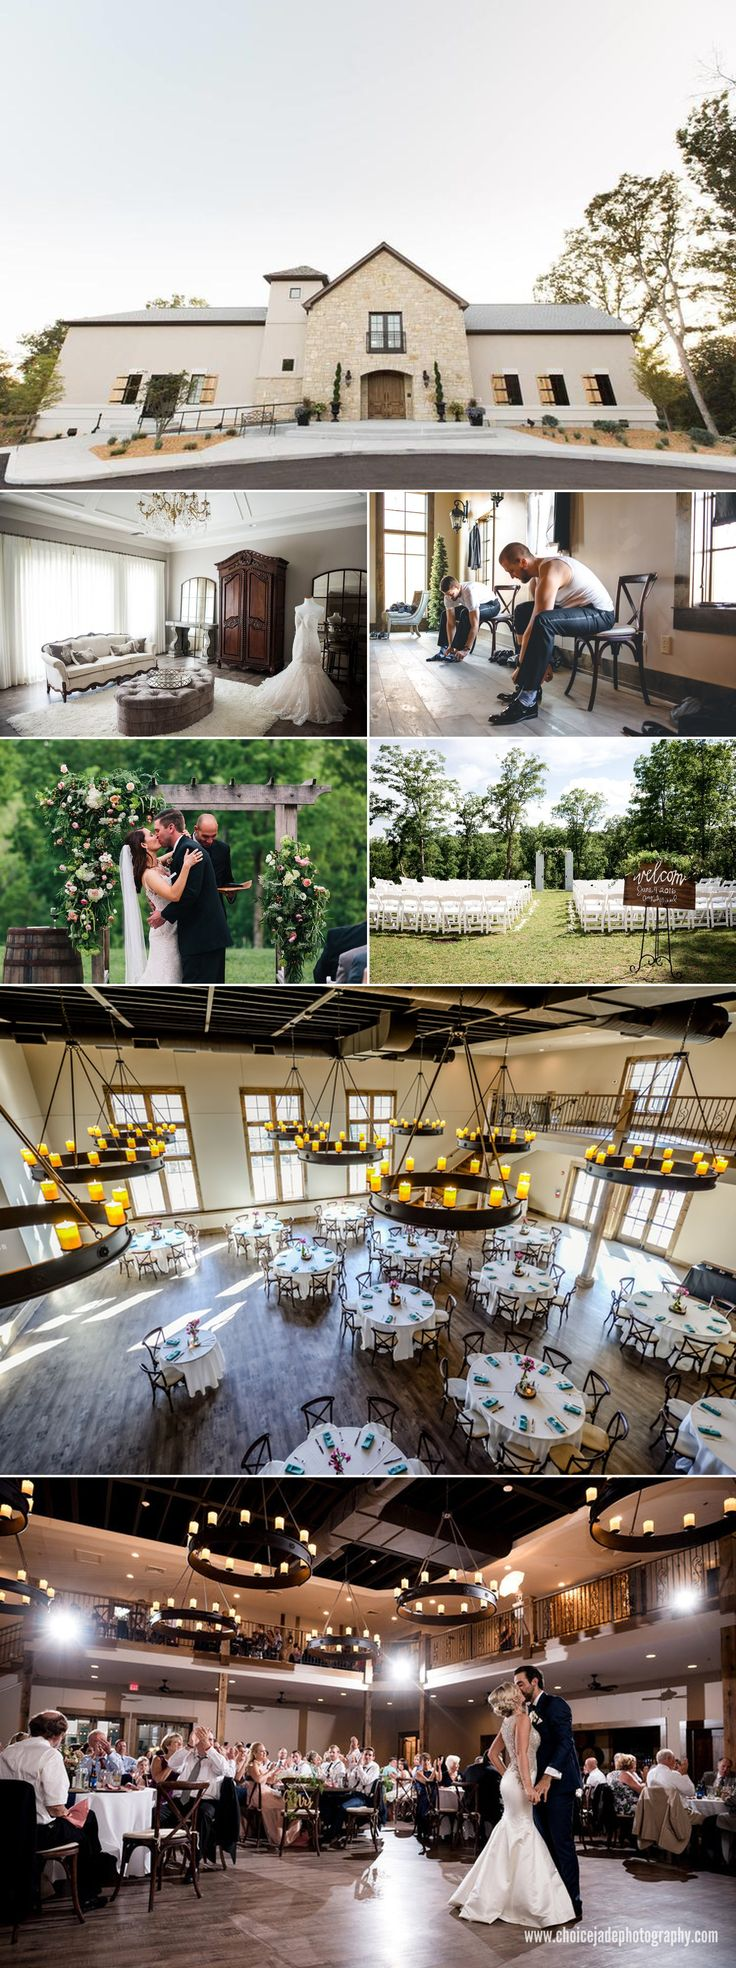 amazing new wedding venue in st louis: silver oaks chateau wedding